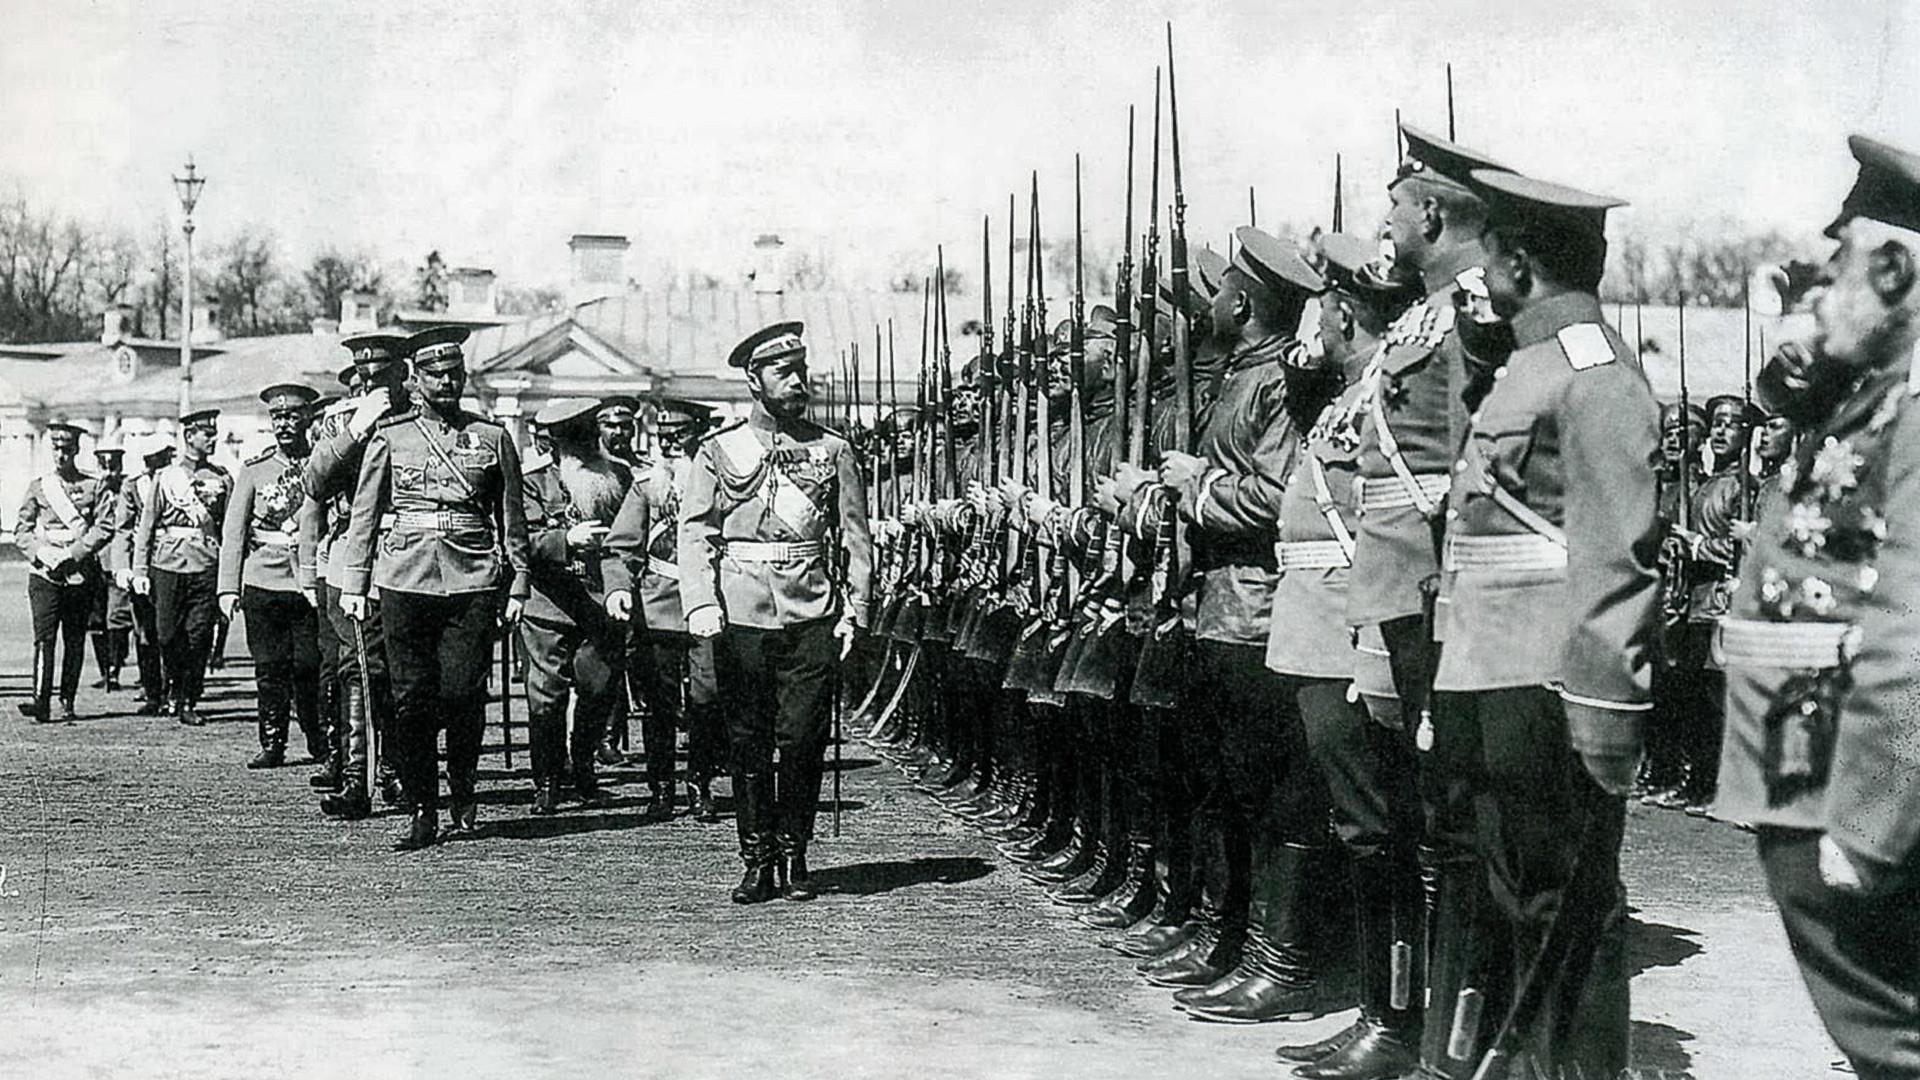 L'empereur russe Nicolas II avec les soldats du régiment Izmaïlovski